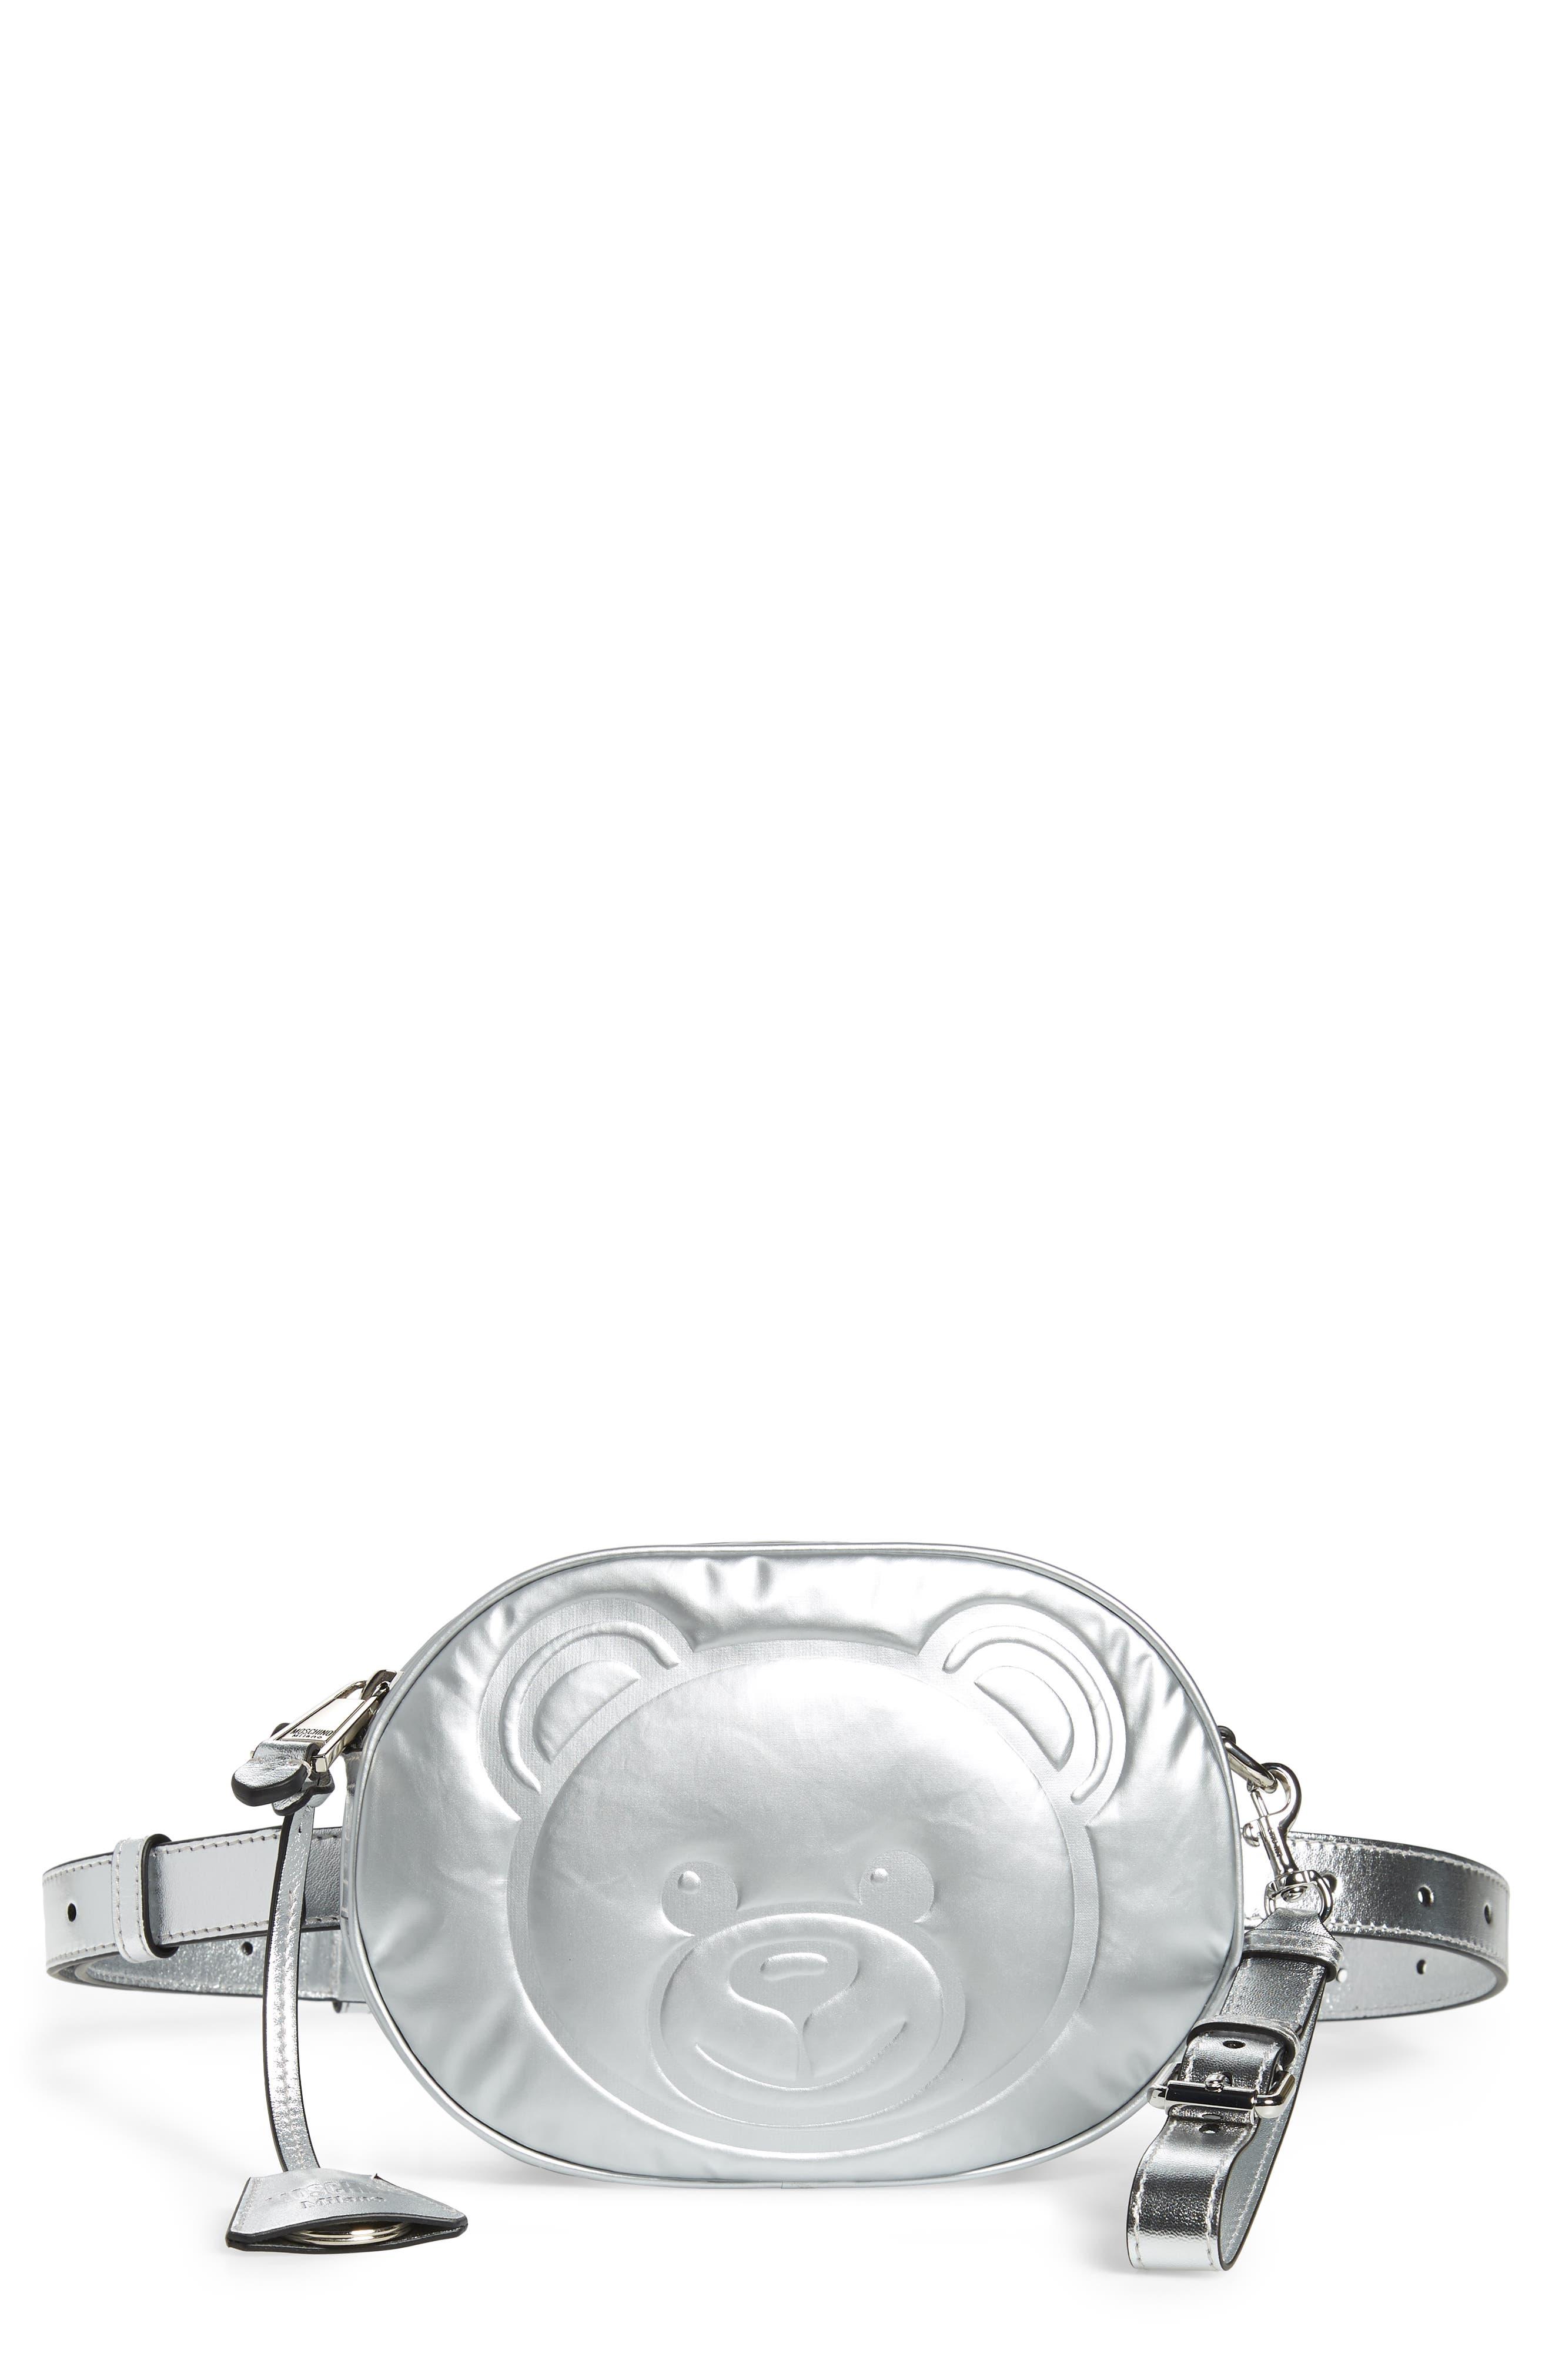 MOSCHINO Silver Teddy Belt Bag, Main, color, SILVER